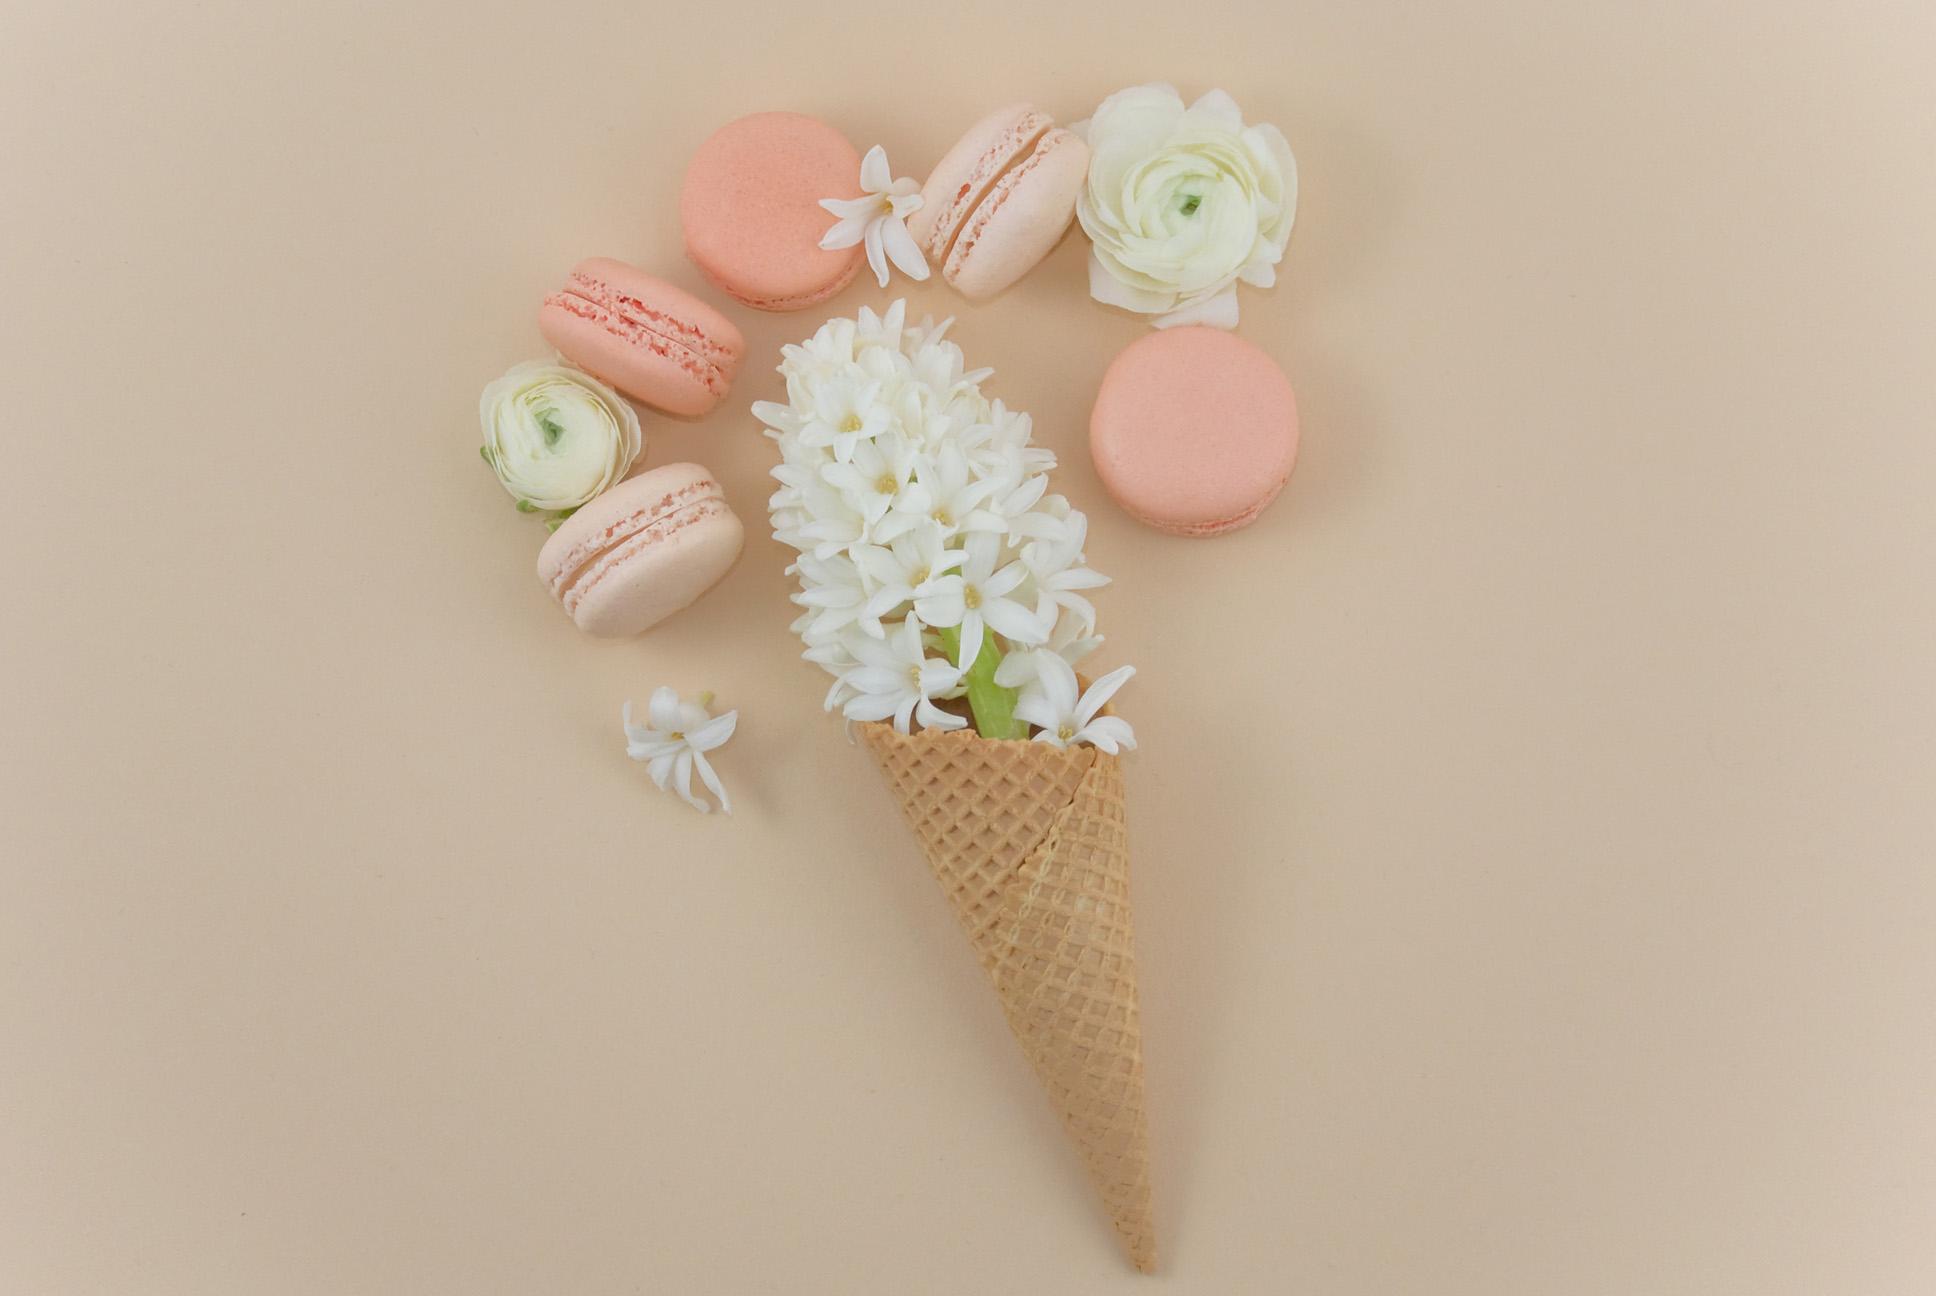 La petite Bellerose, Macaron Eis Peach